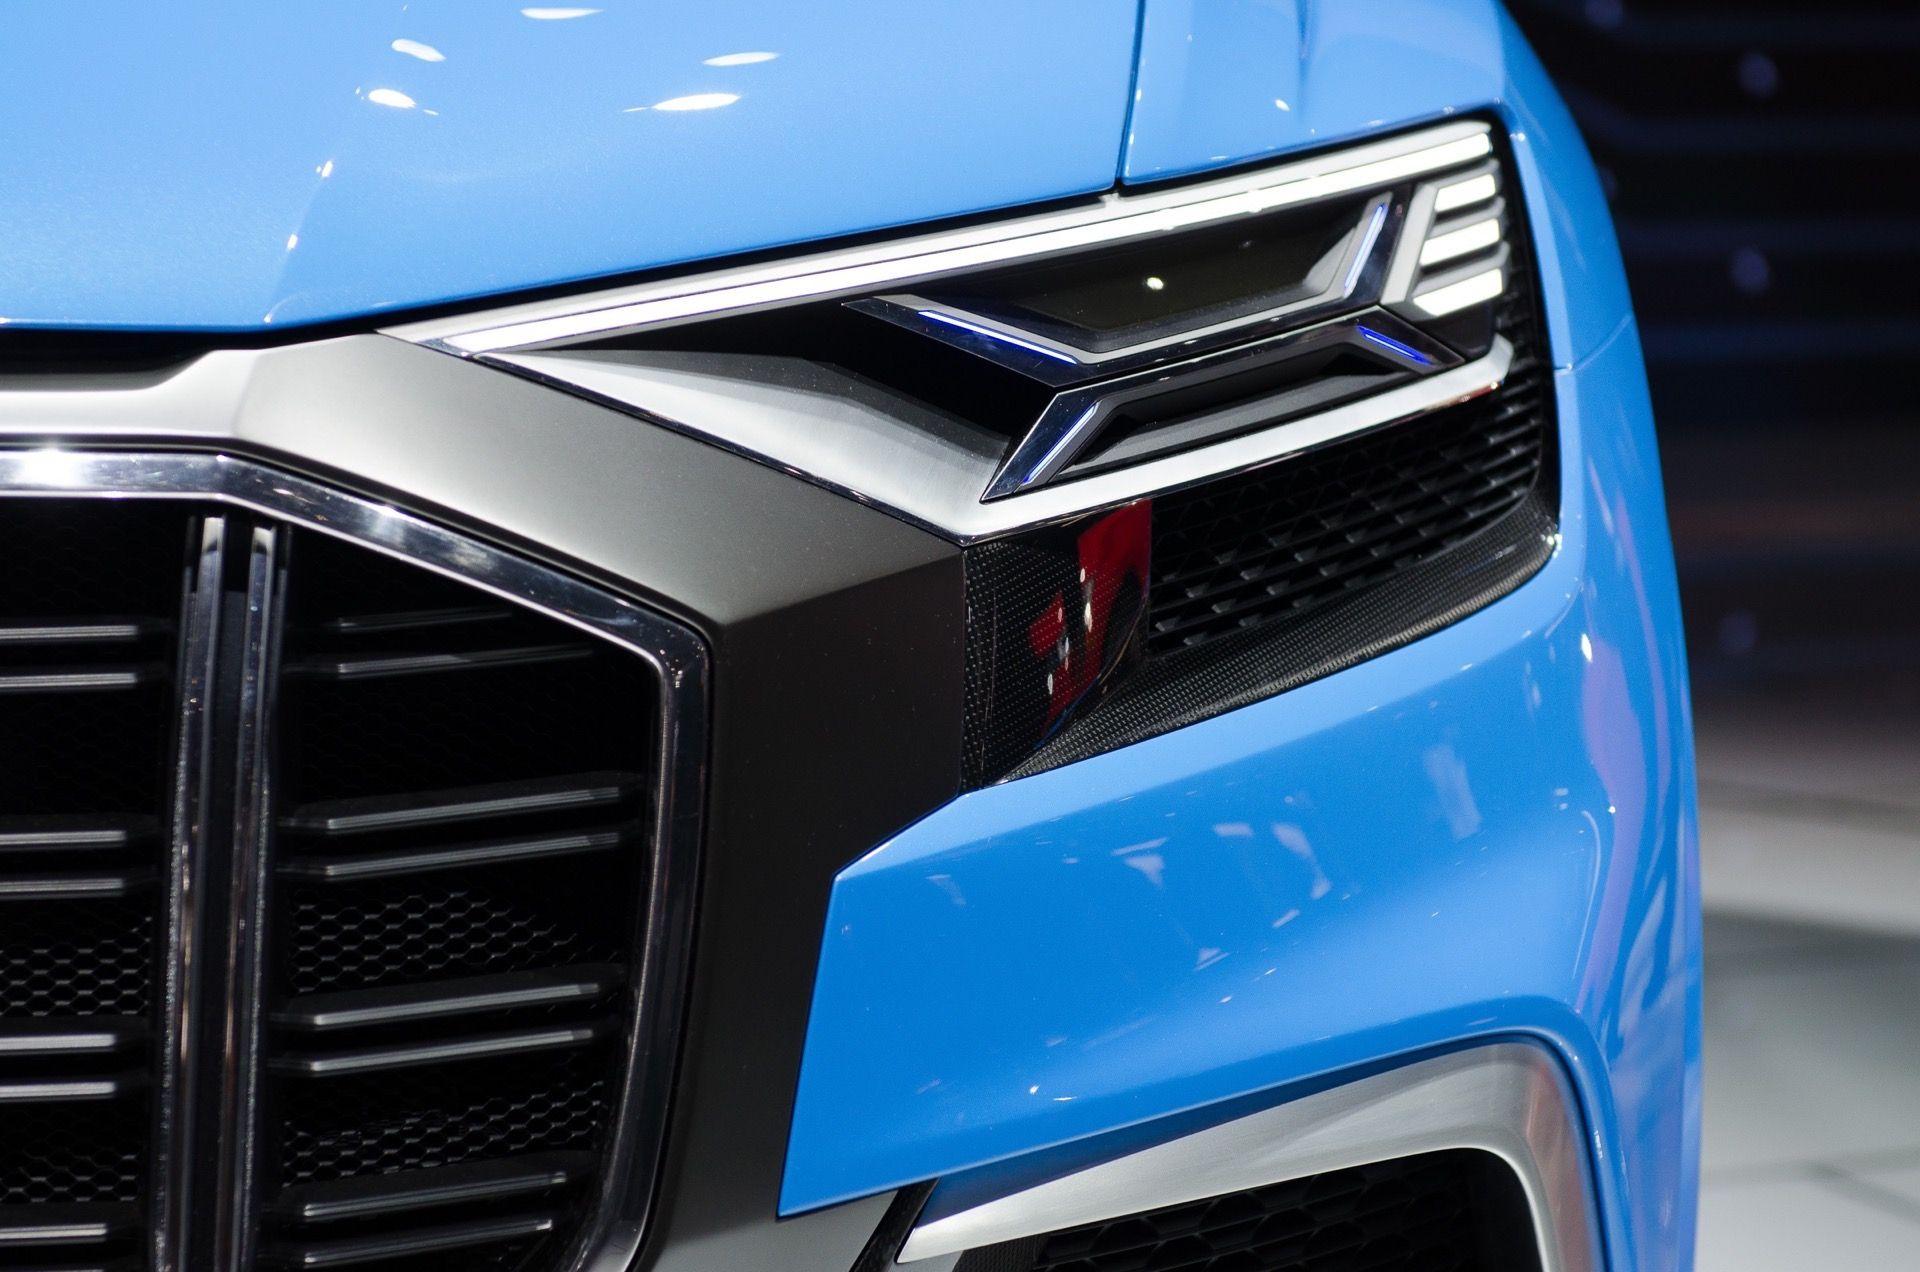 Audi Matrix Laser Headlights Won't Be Coming to America